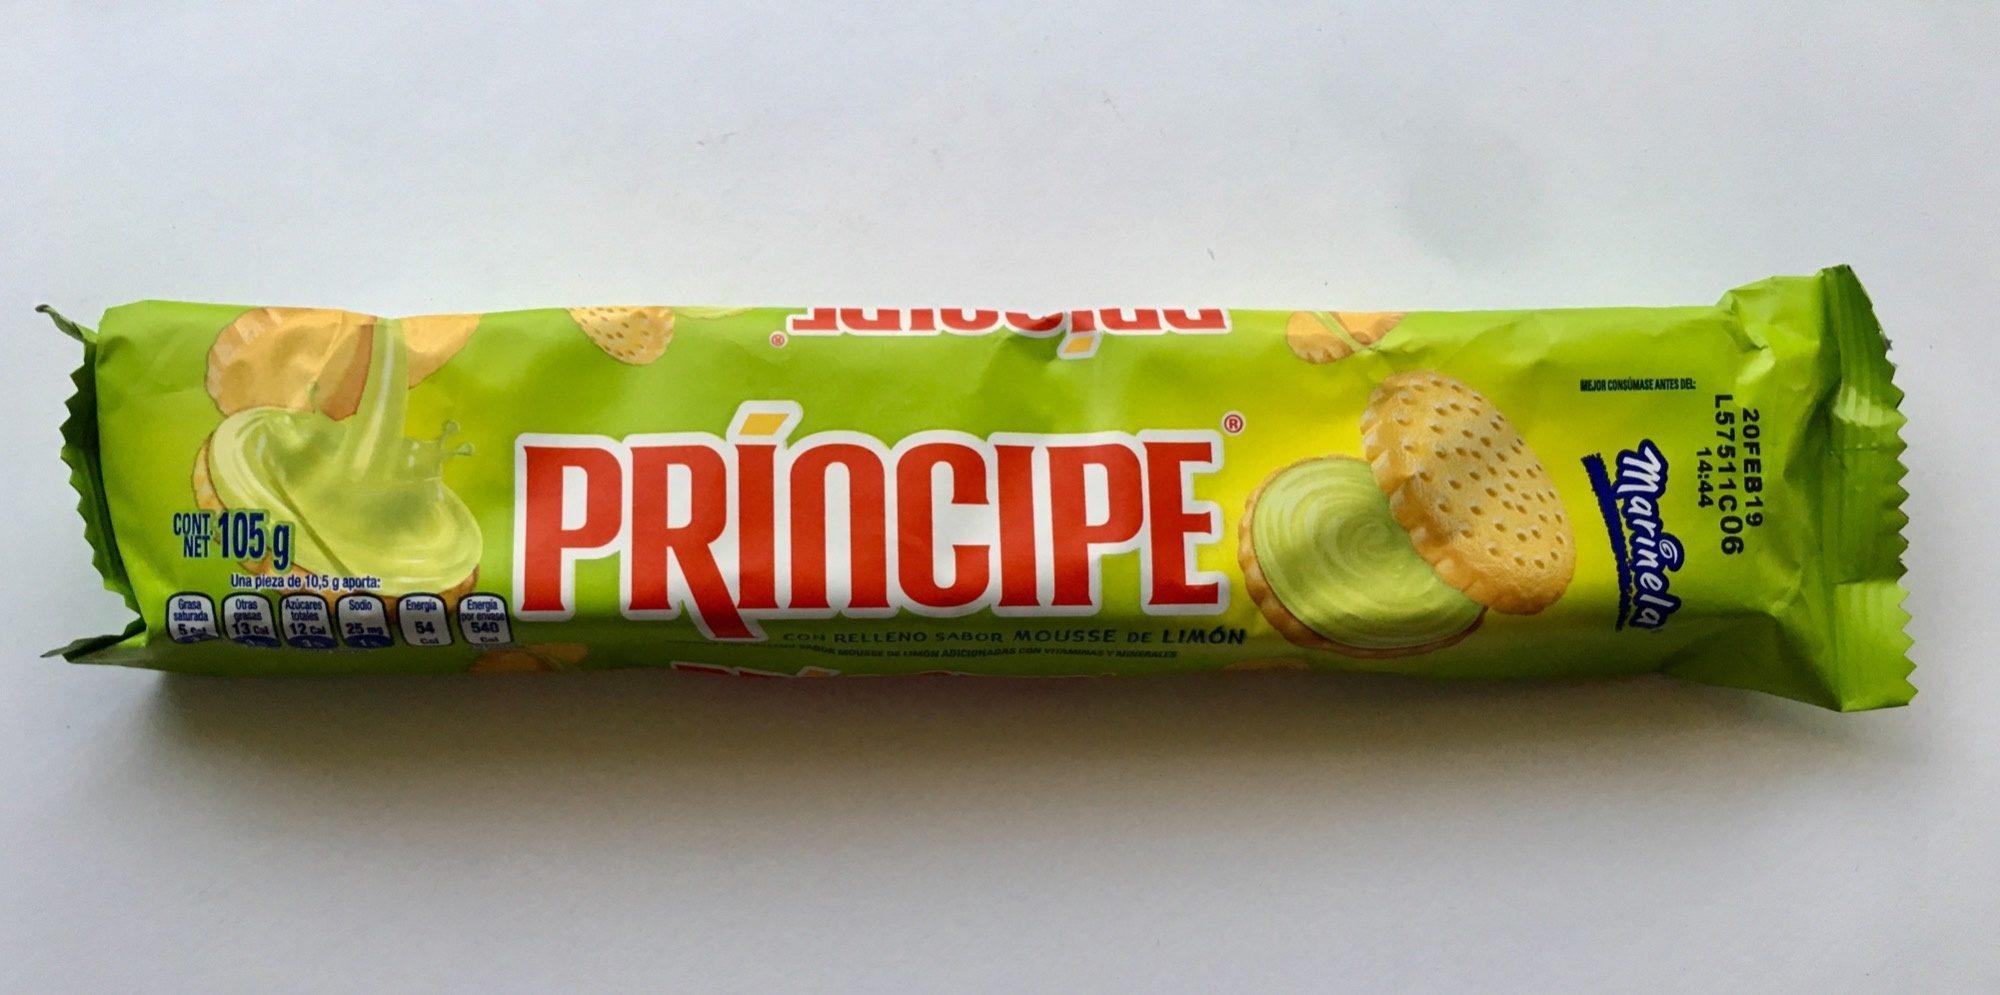 Galletas Príncipe Mousse de Limón Marinela - Product - es